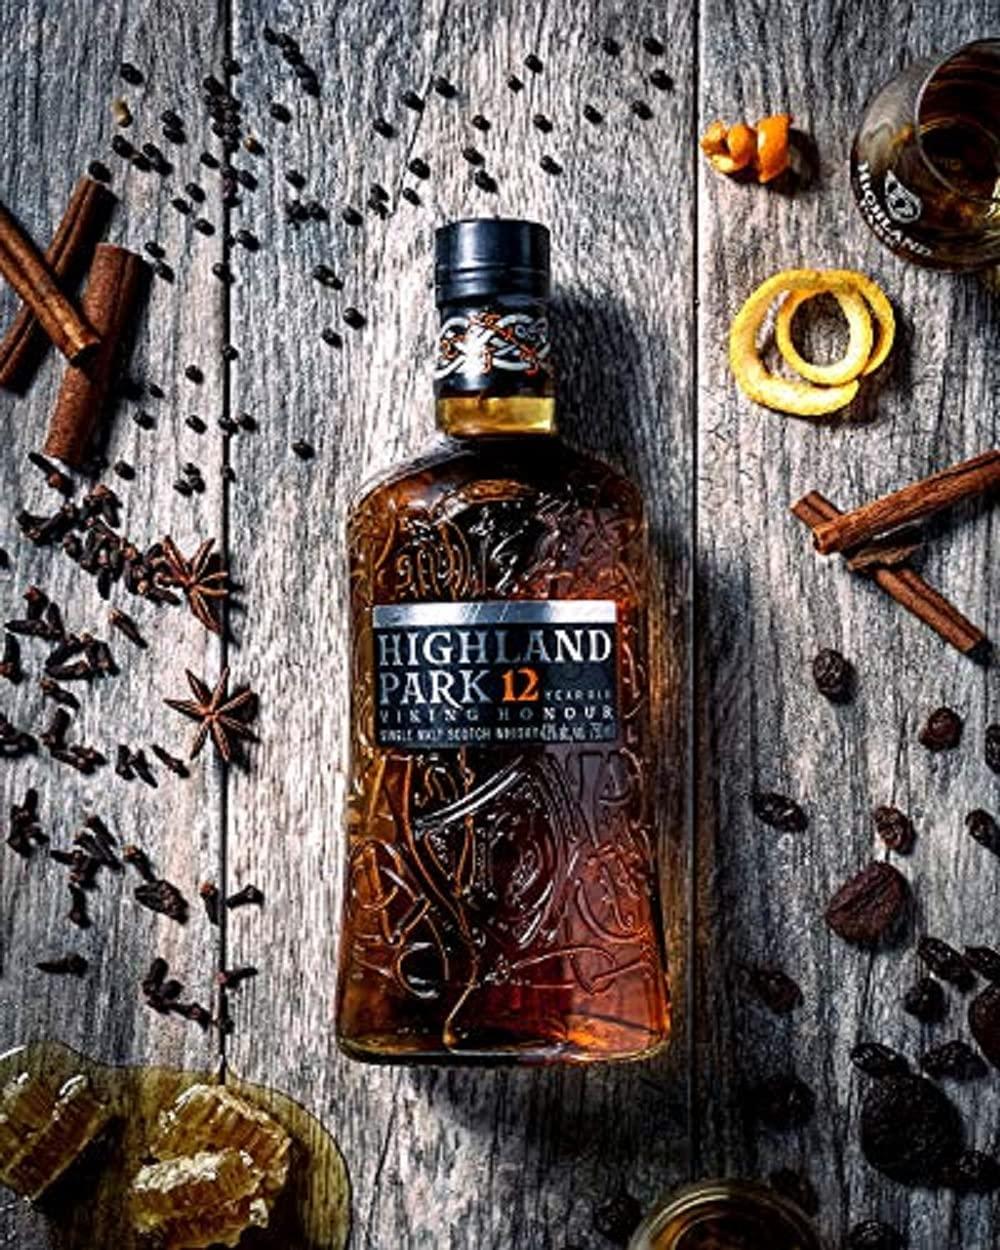 Highland Park 12 Jahre Viking Honour Single Malt Scotch Whisky 1 x 0.7 l